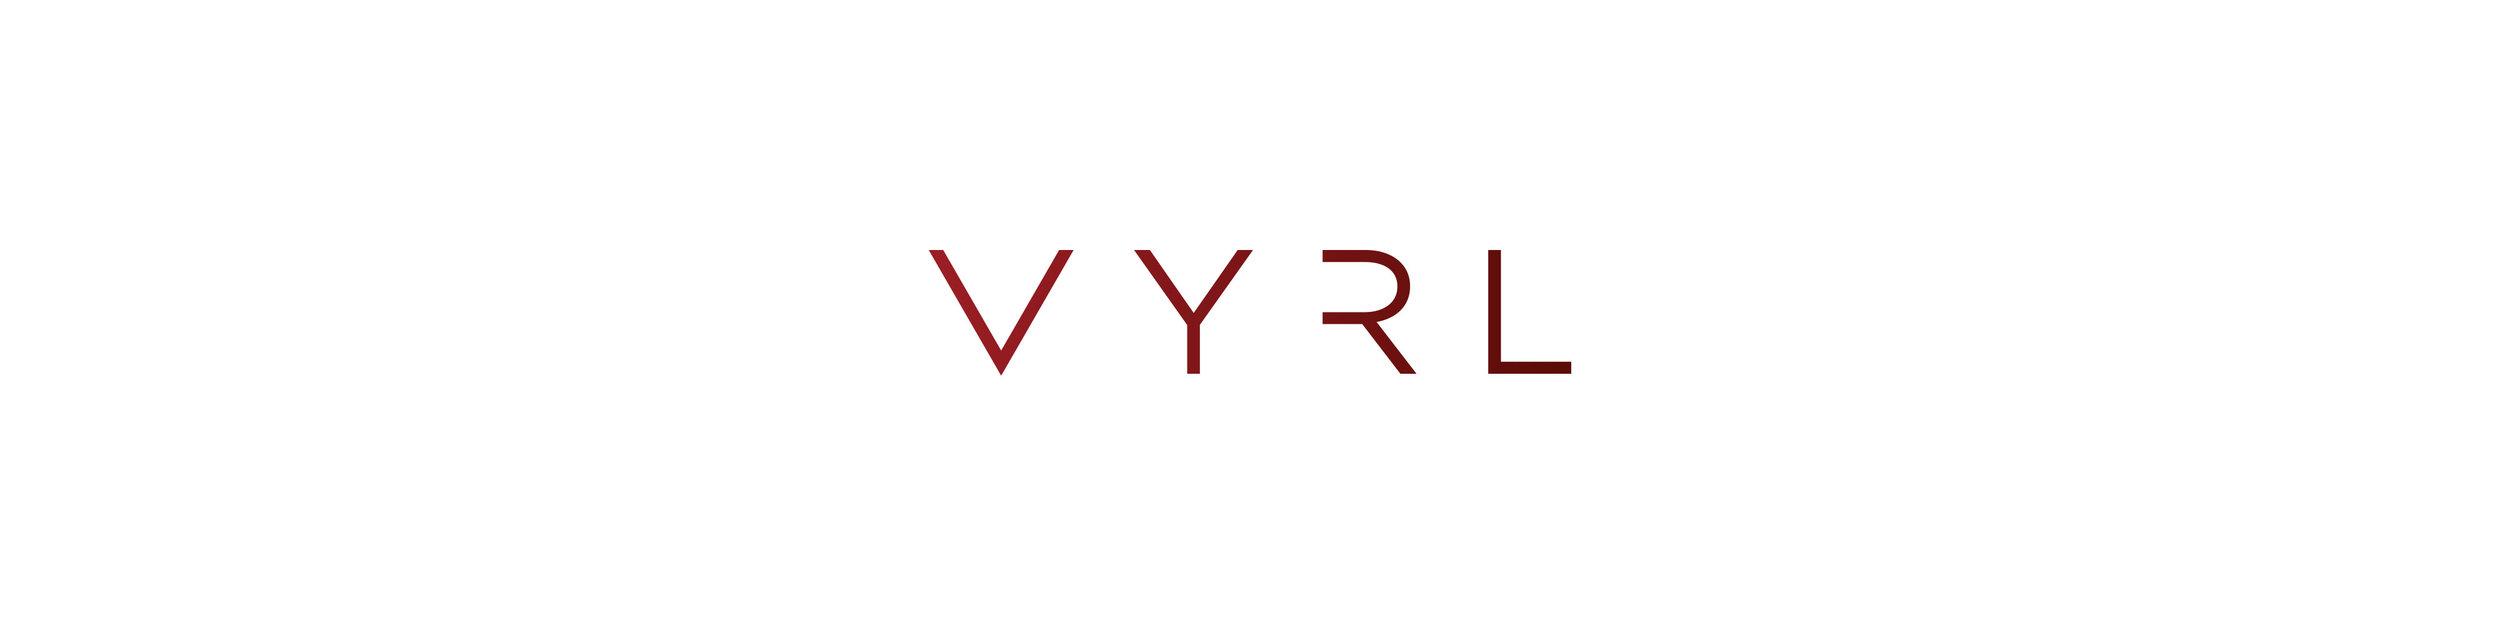 VYRL-1.jpg